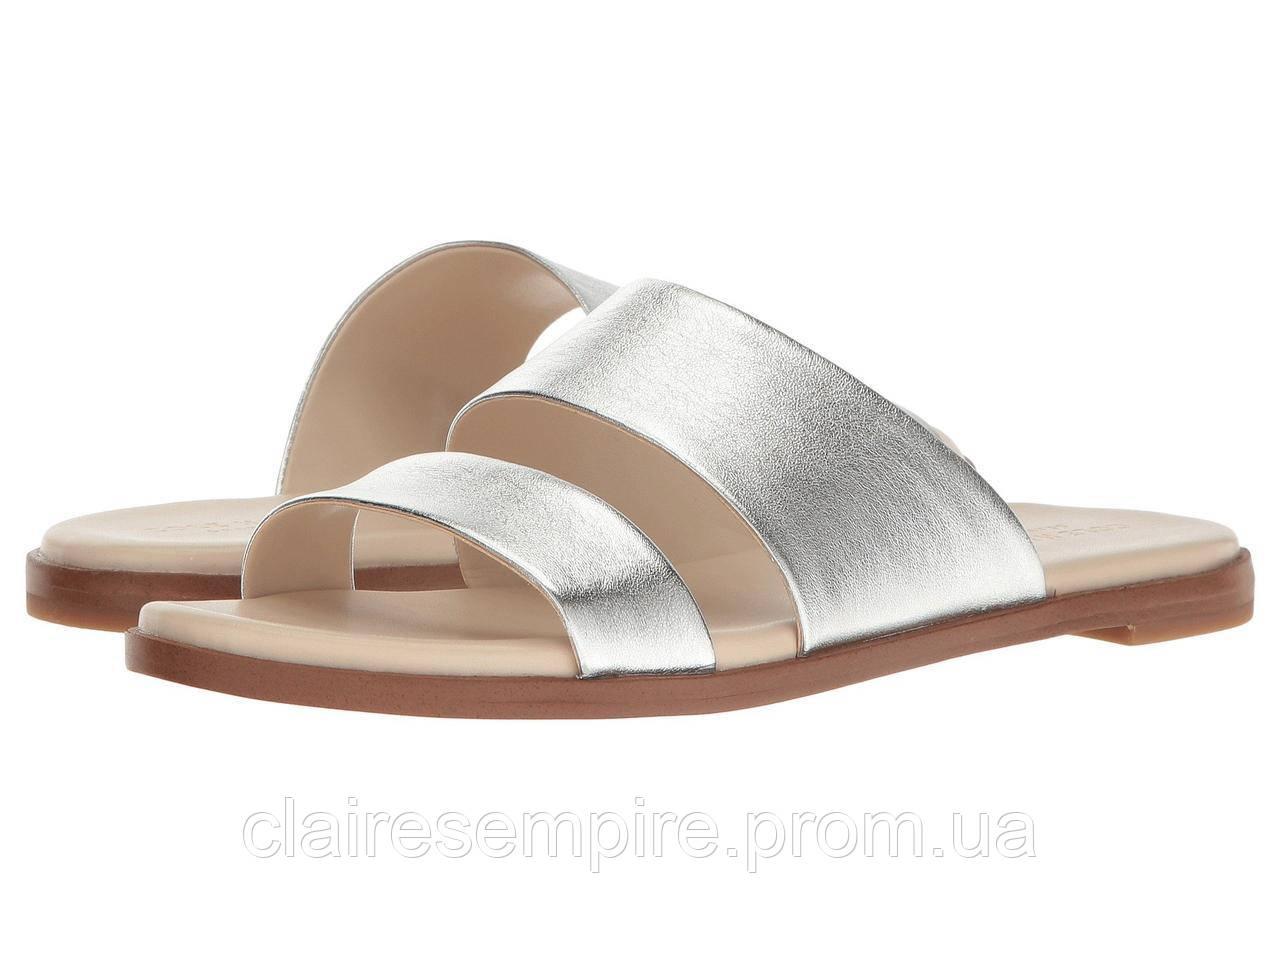 Кожаные сандалии Cole Haan, оригинал, Серебро 36